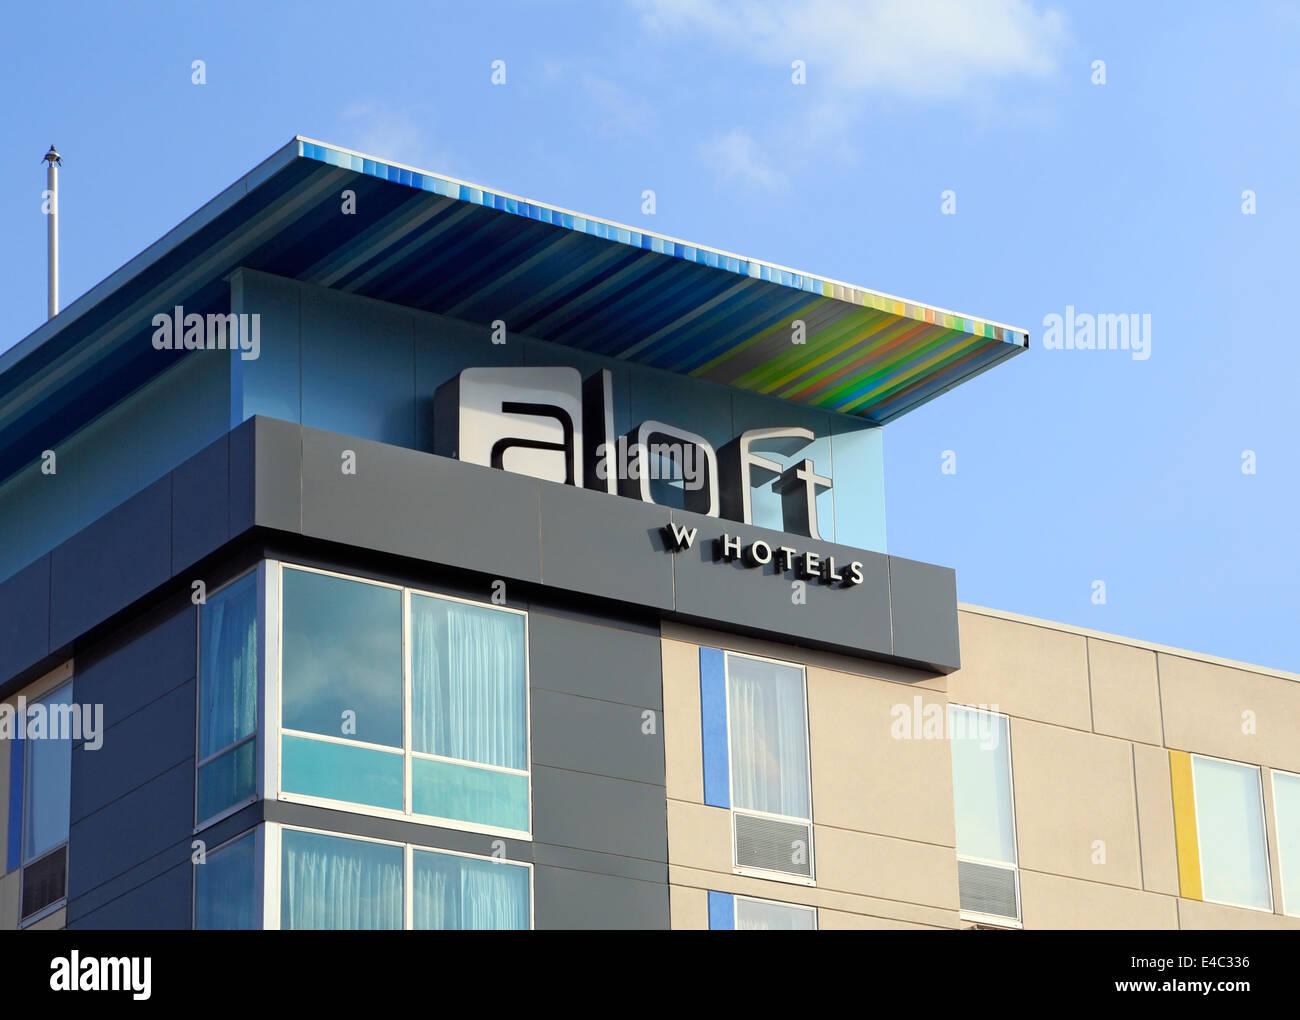 Aloft hotel in Asheville, North Carolina. - Stock Image